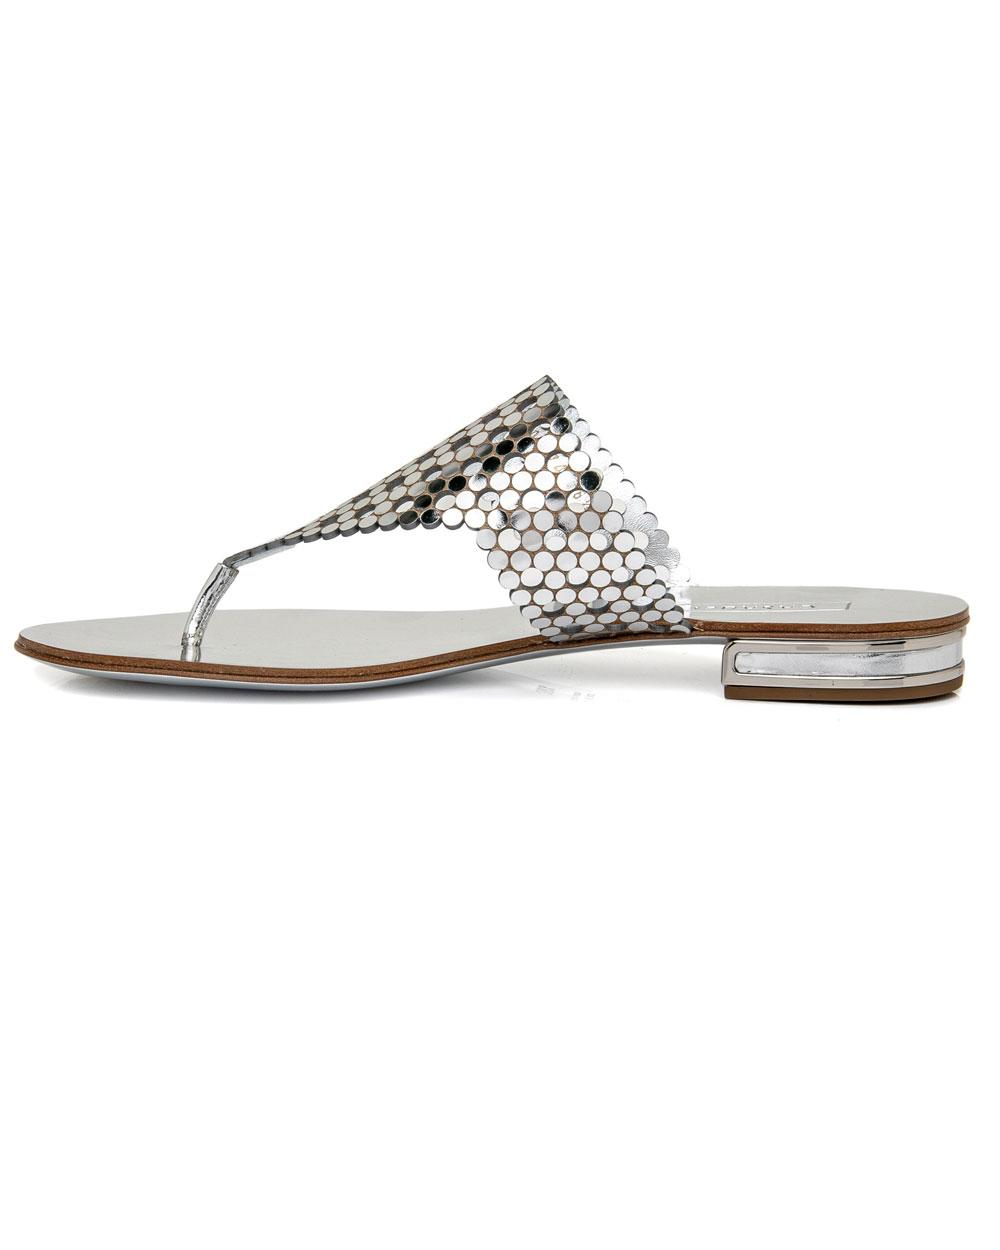 67f0bf6b1 Casadei - Metallic Isa Flat Thong Sandal In Silver - Lyst. View fullscreen